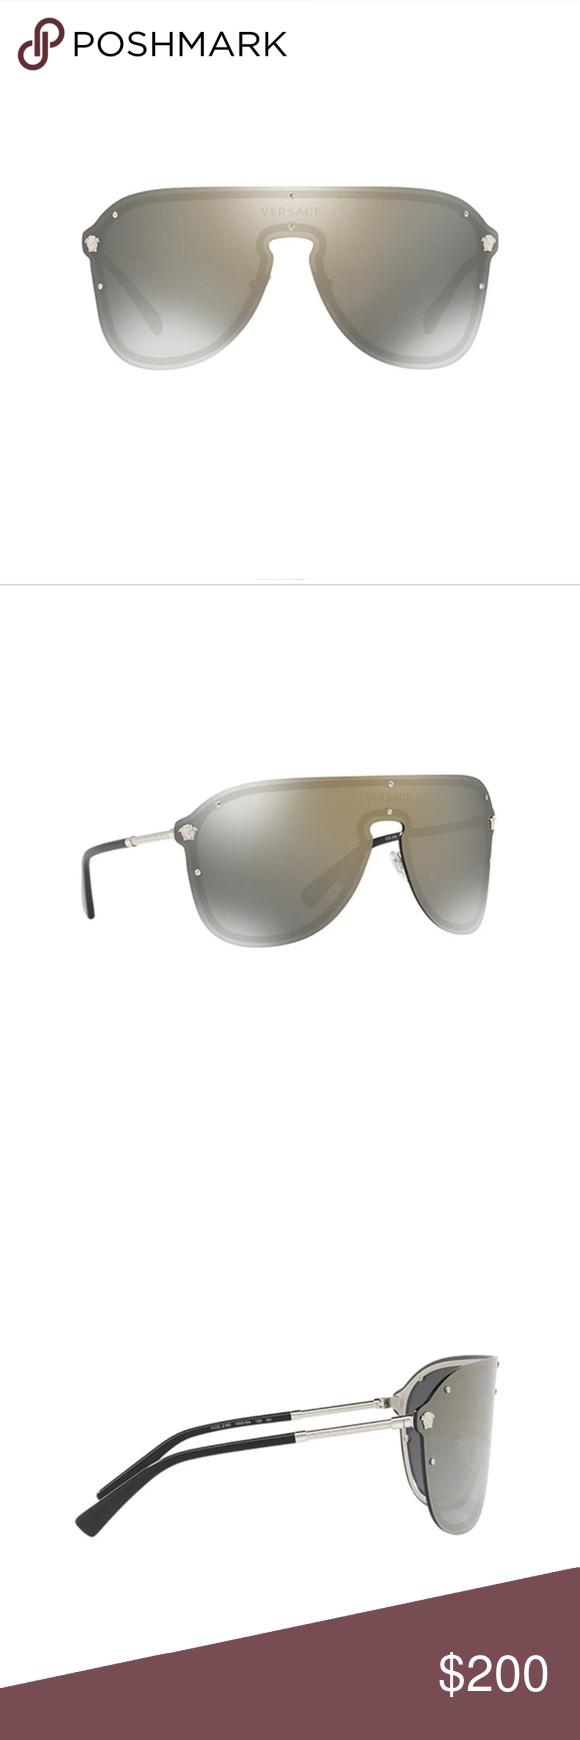 Versace Sunglasses Sunglasses Accessories Versace Sunglasses Accessories